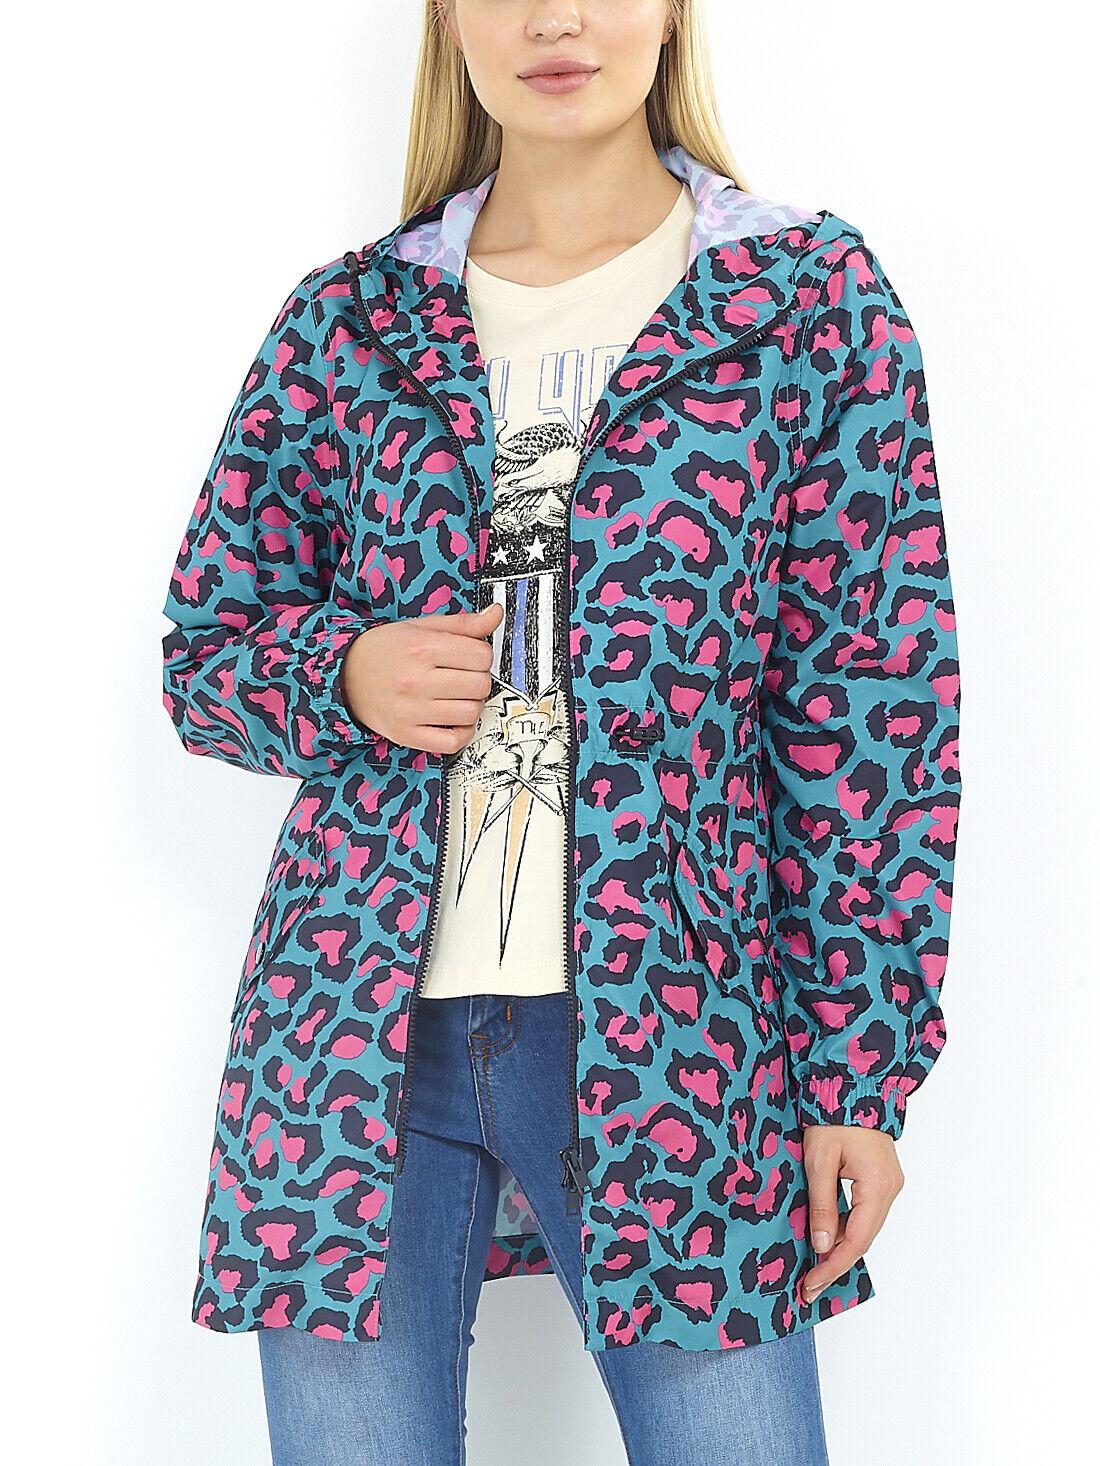 New Womens Showerproof Leopard Print Hooded Rain Mac Lightweight Coat Sizes 8-16